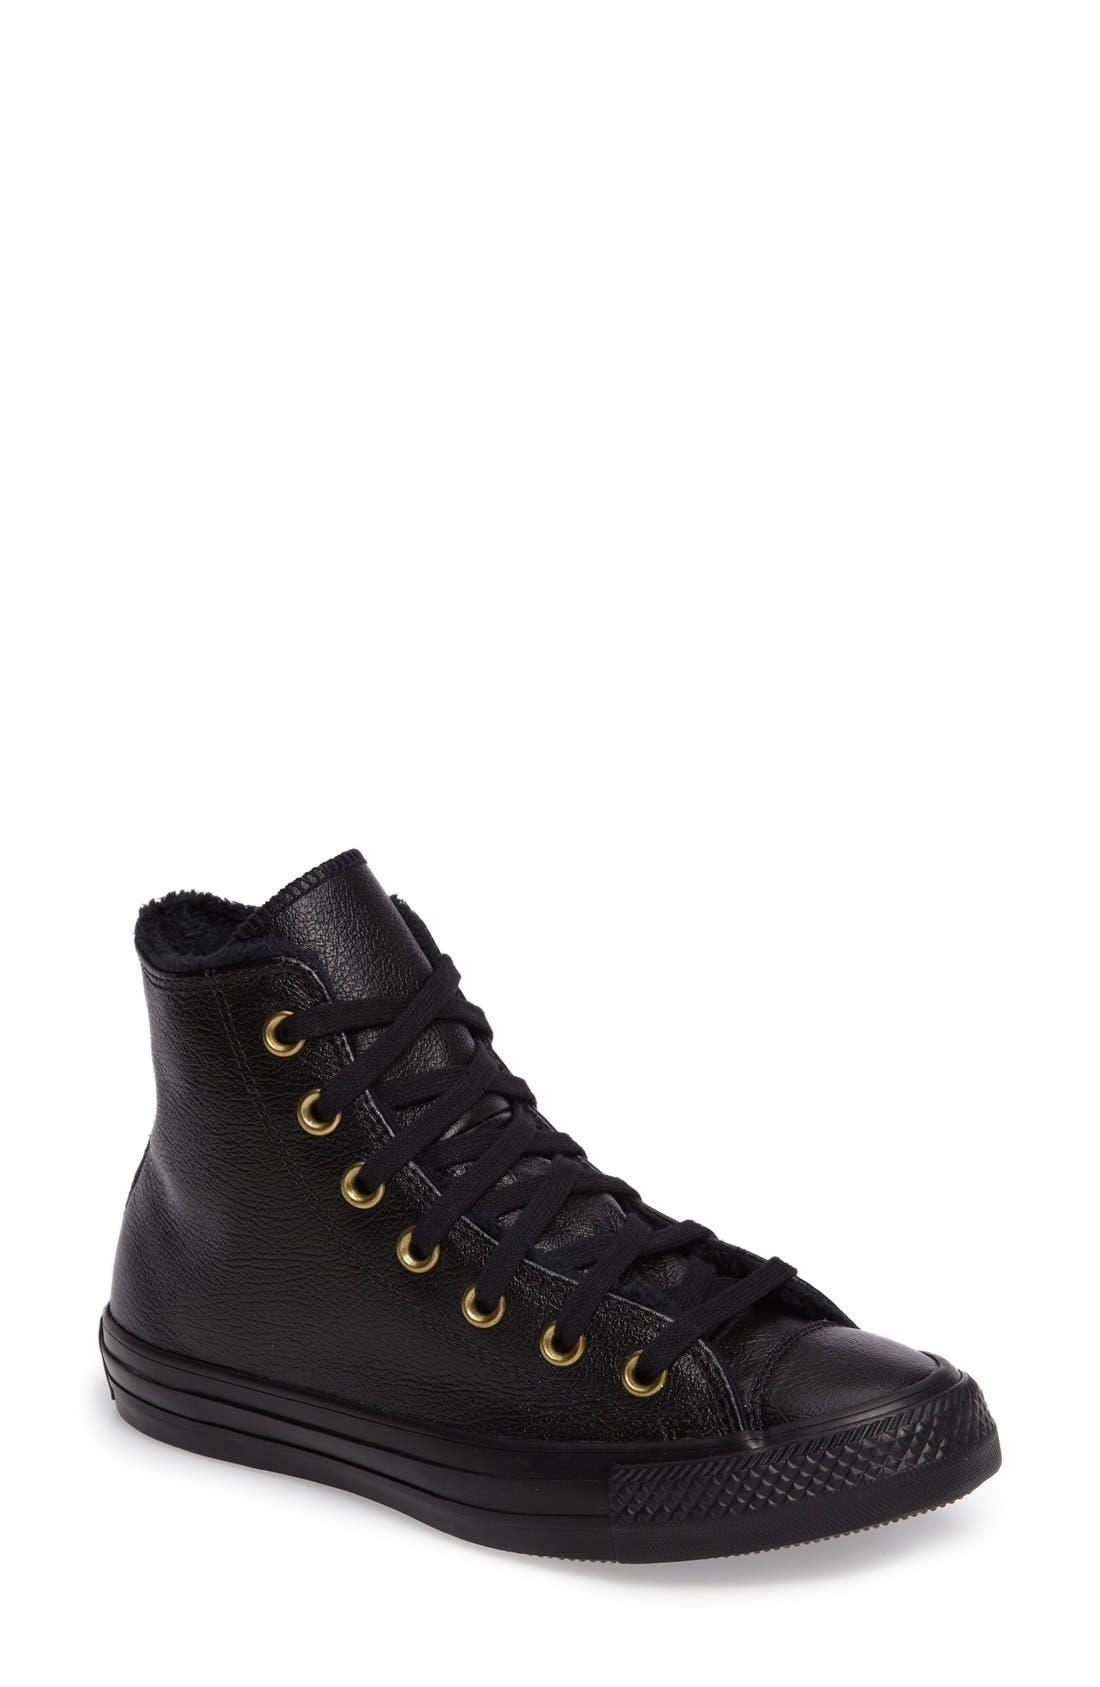 Main Image - Converse Chuck Taylor® All Star® Faux Fur High Top Sneaker (Women)